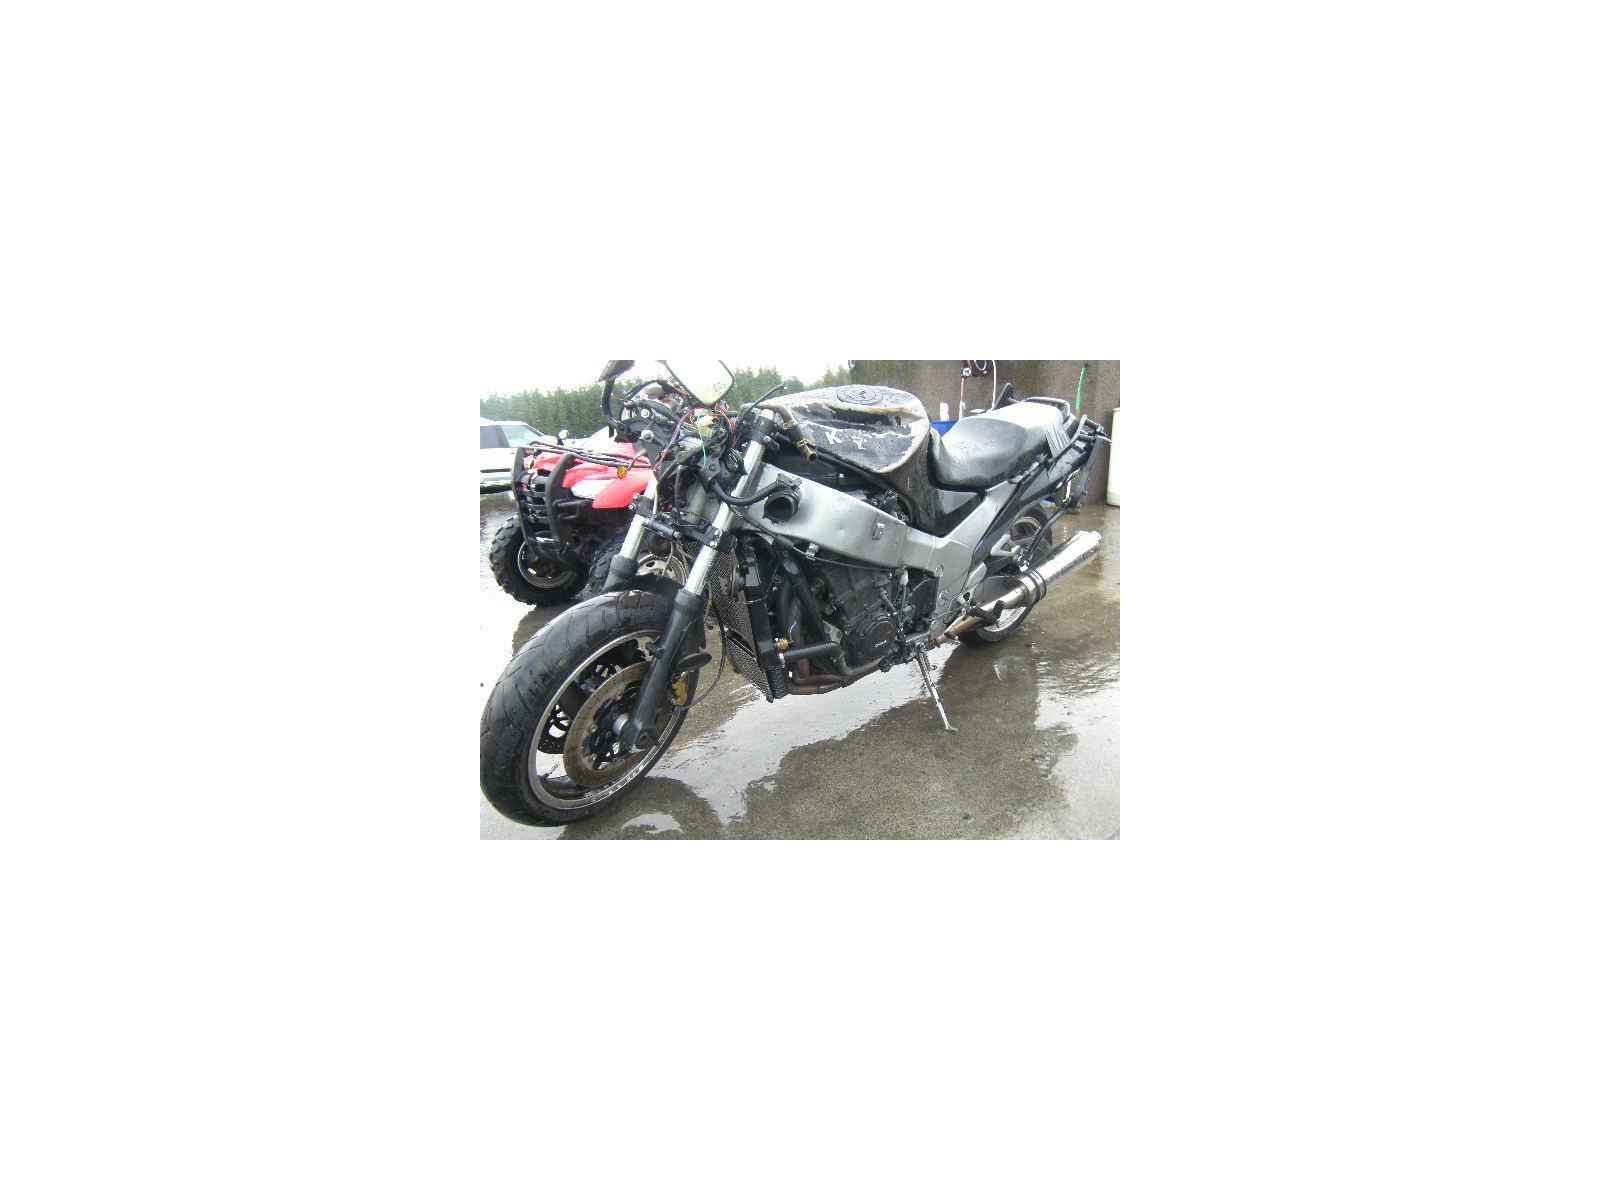 Zzr1100 Manual Pin 2001 Ducati Monster 900 Wiring Diagram On Pinterest Array 1998 Kawasaki Zx 1100 D6 Zzr Road Petrol Rh Scbmotorcycles Com